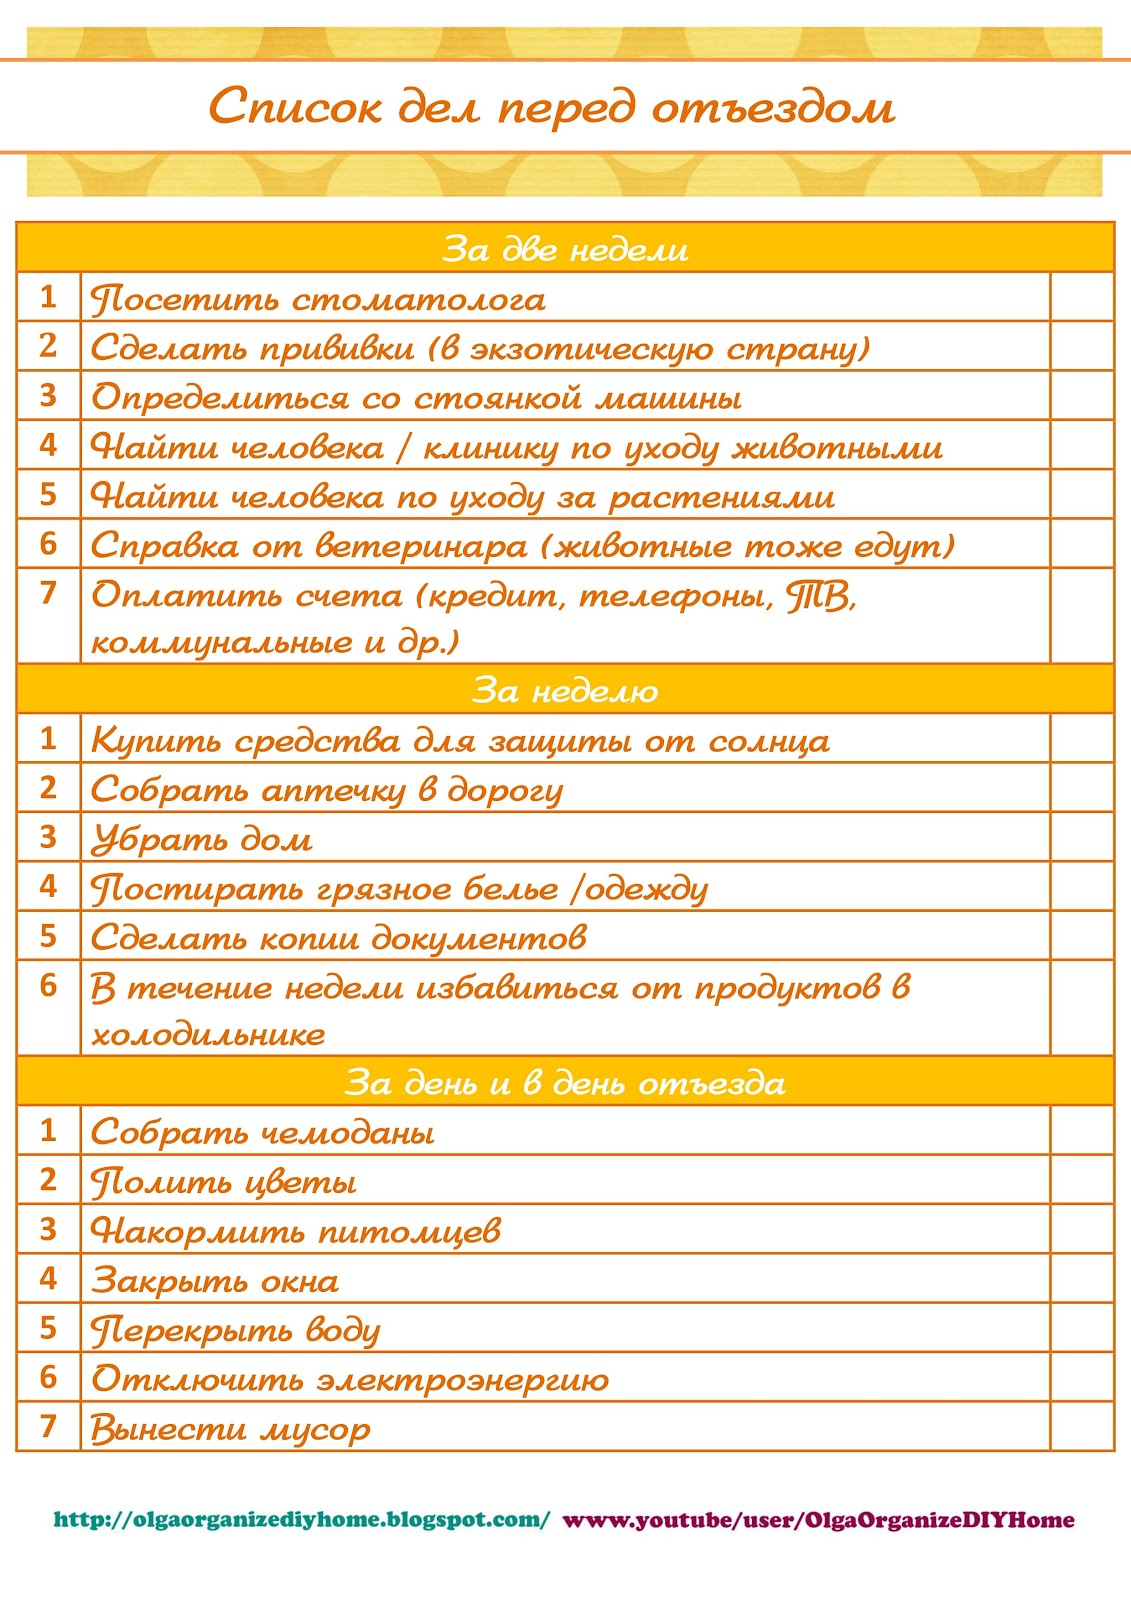 список дел перед отъездом